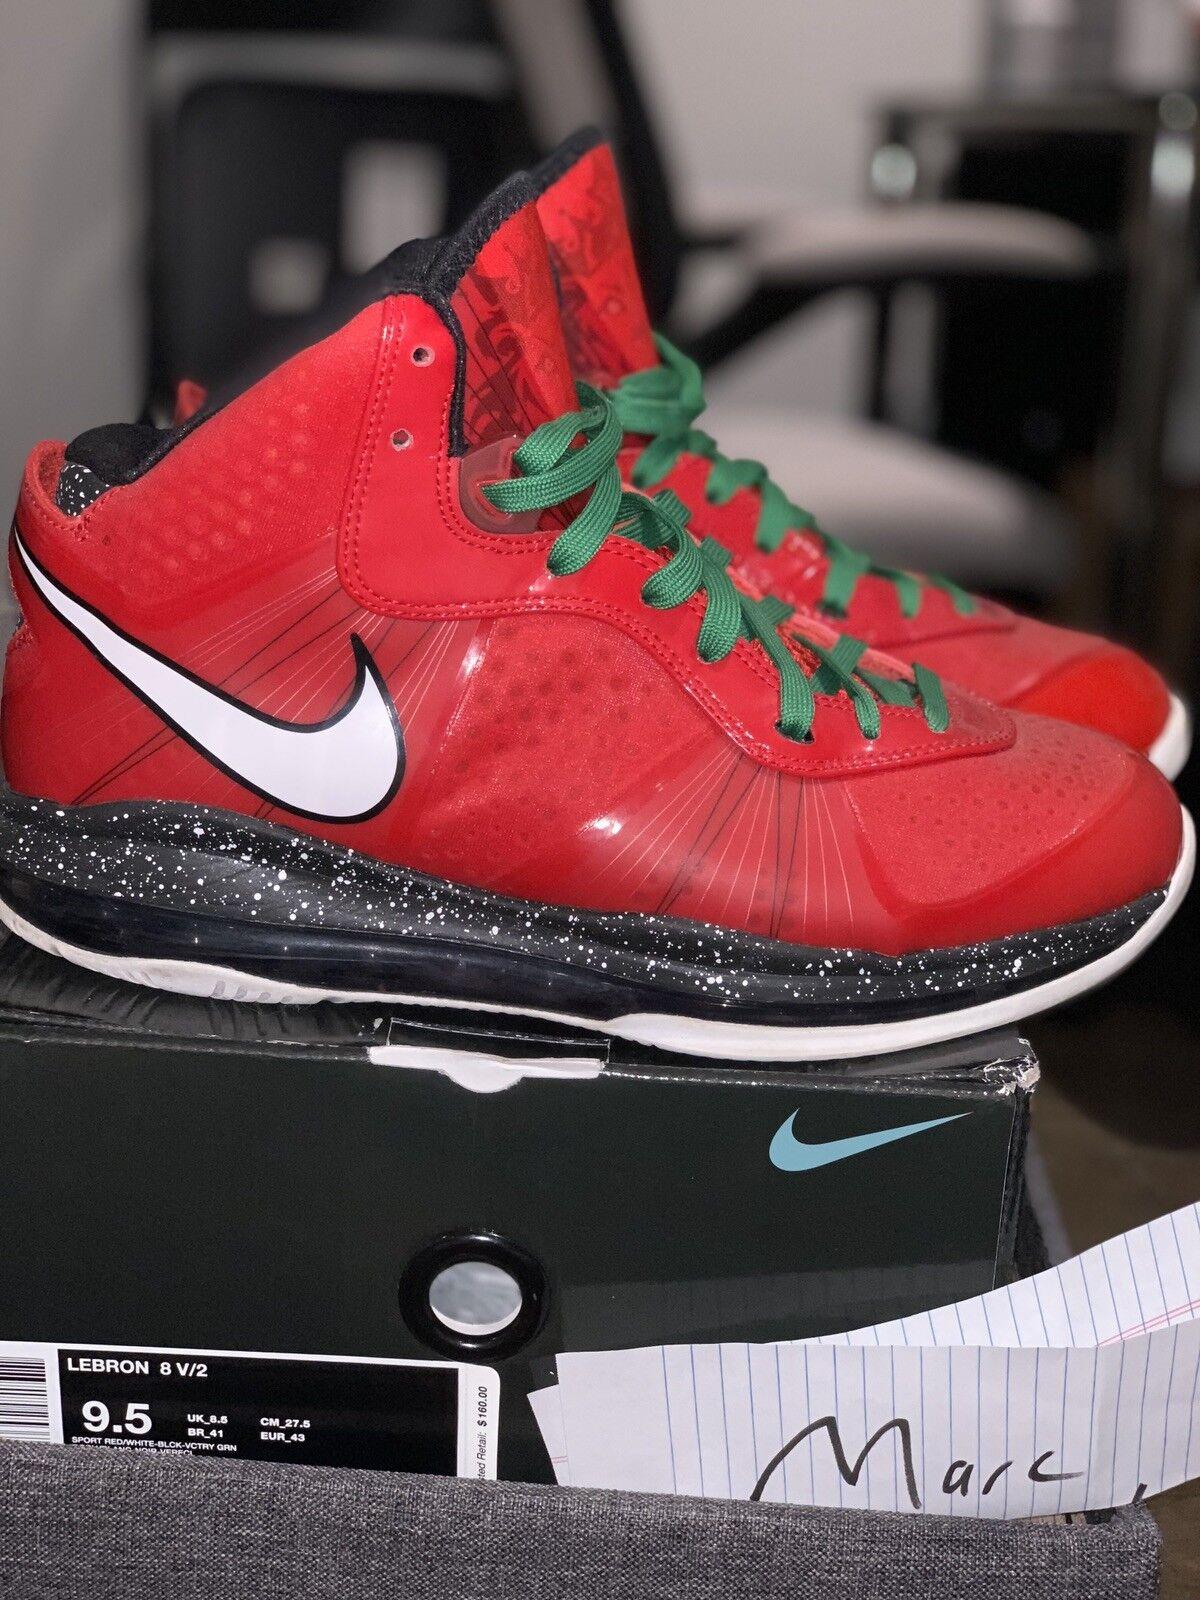 Nike LeBron VIII 8 V 2 Christmas (429676-600)Red Black White Size 9.5